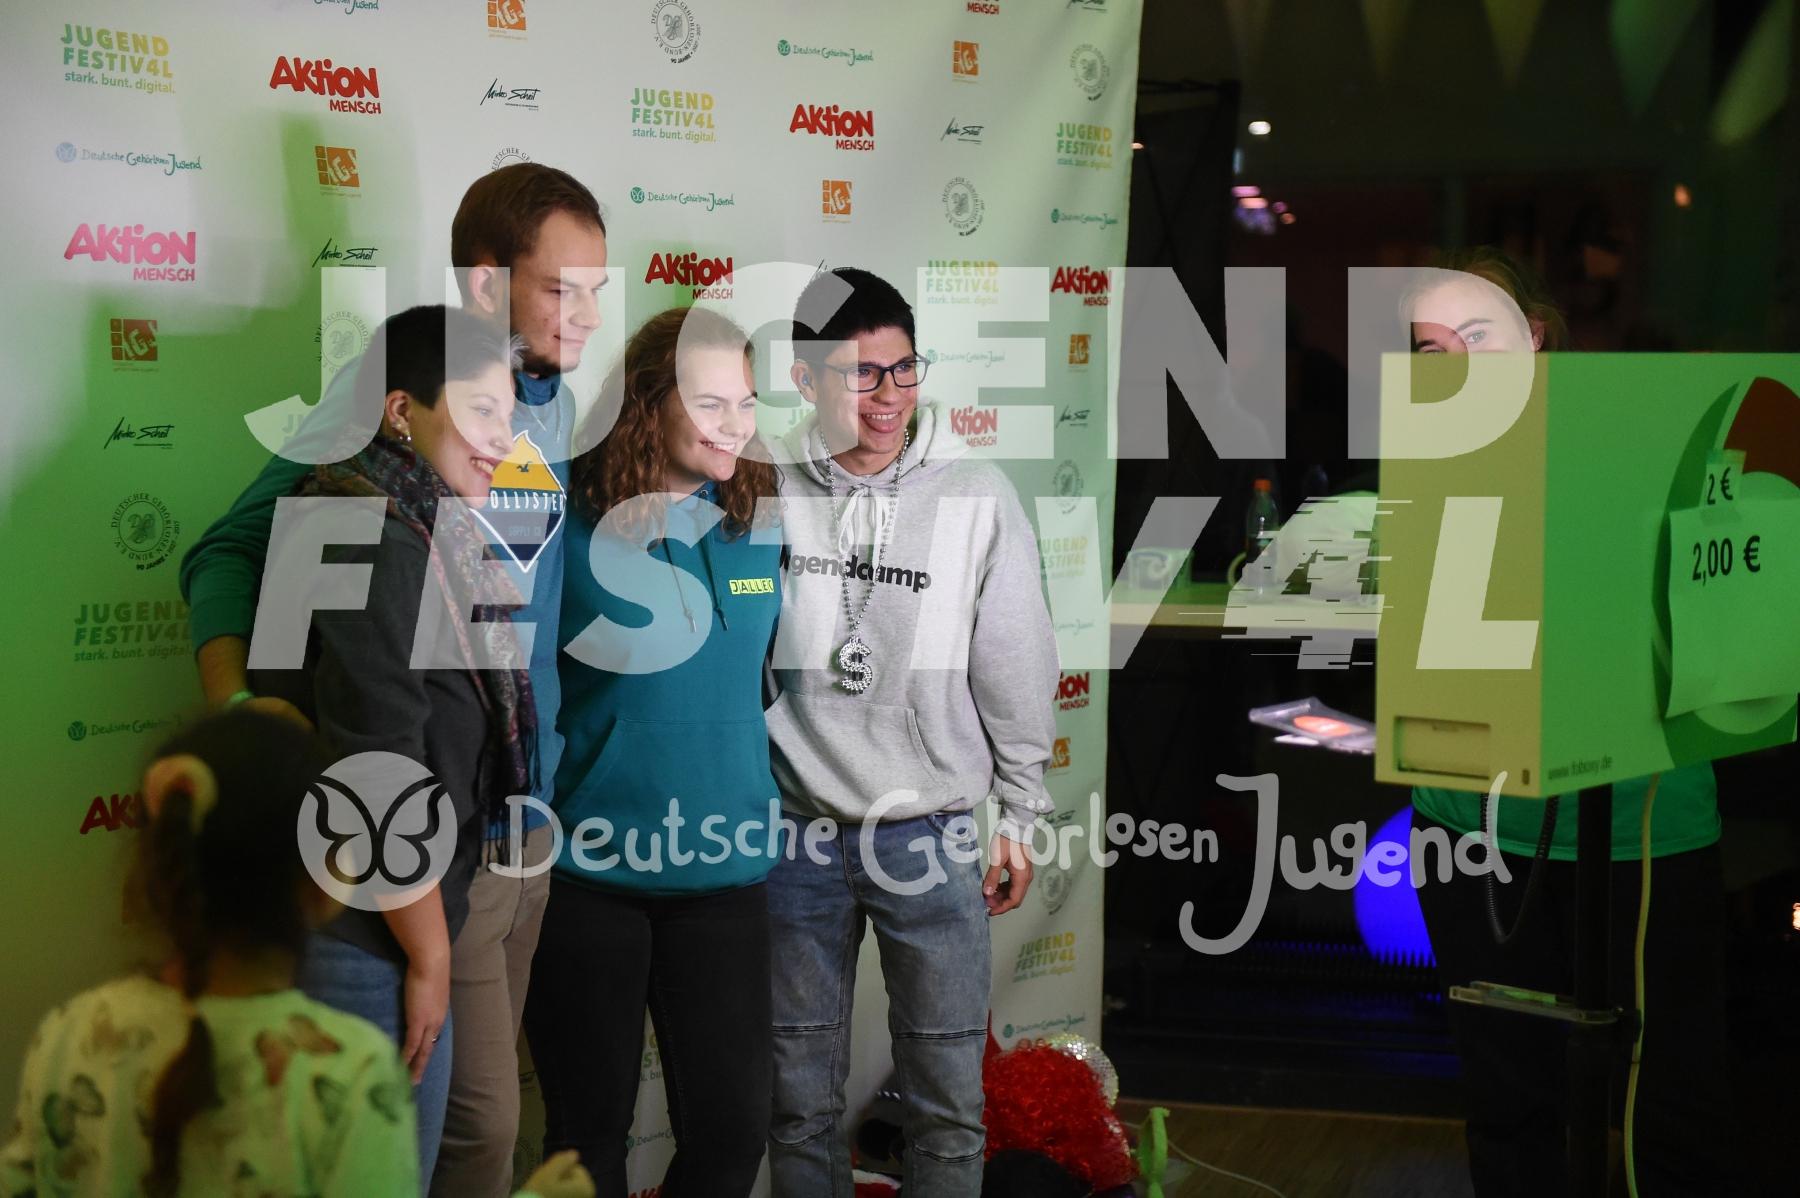 Jugendfestiv4l-130